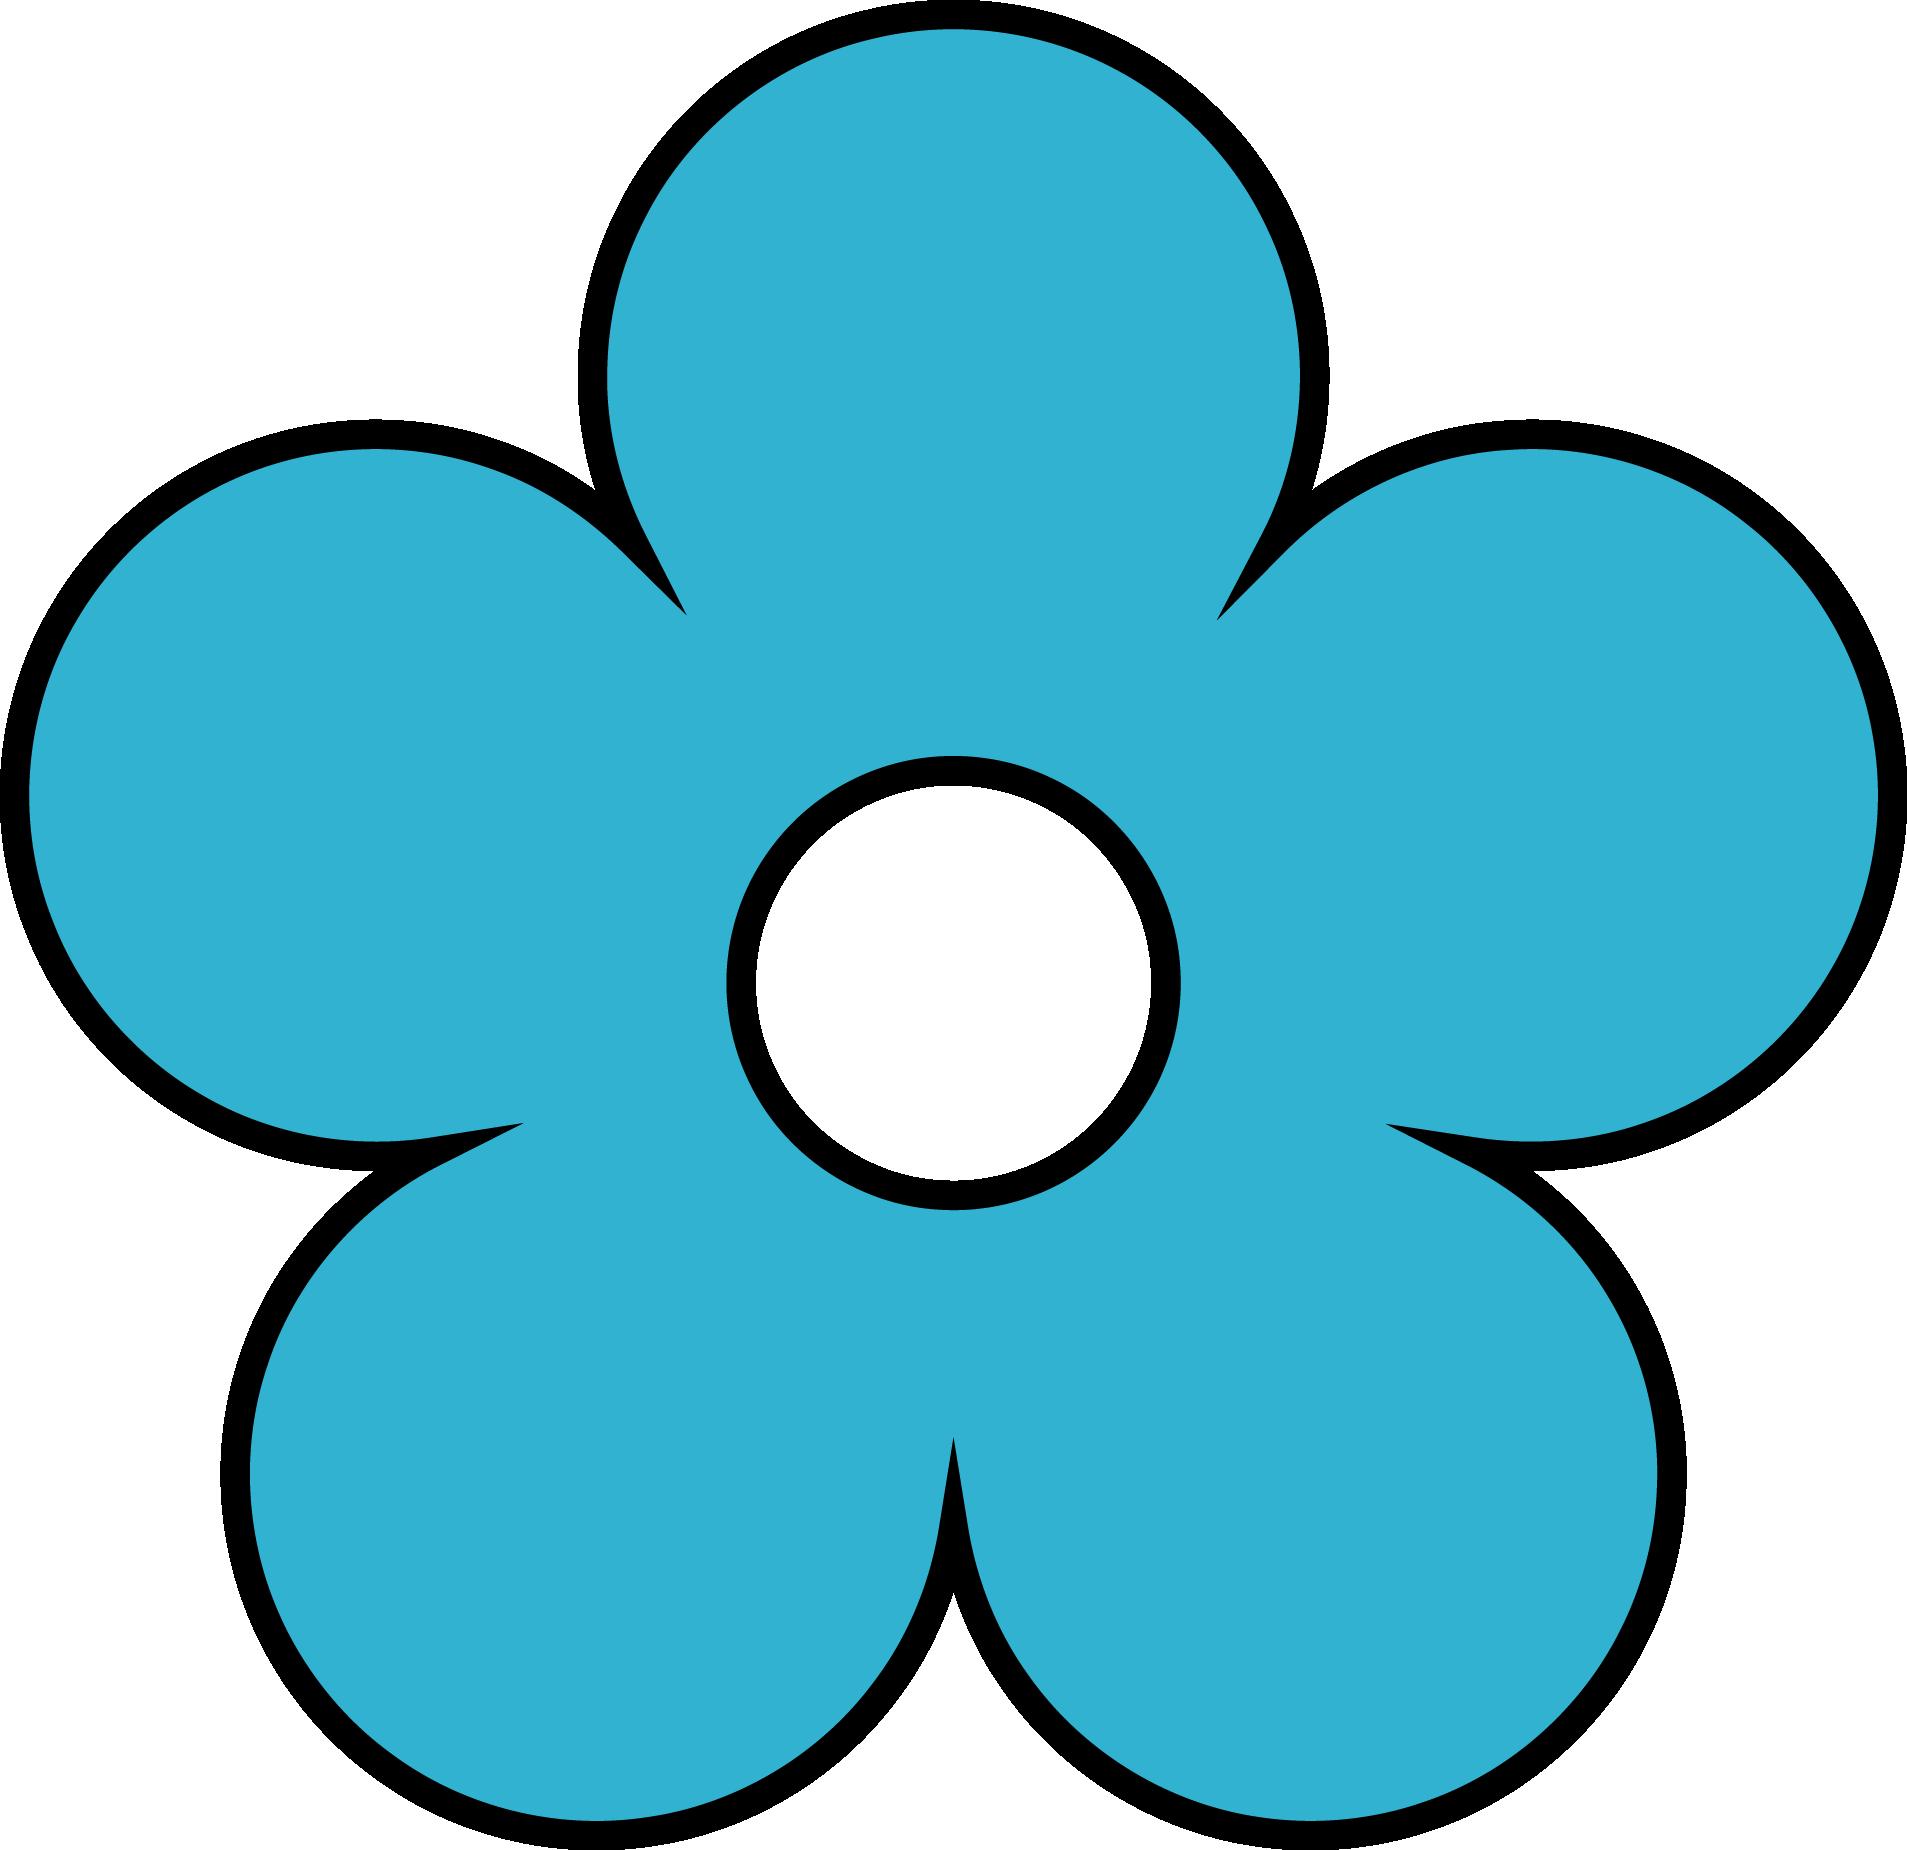 Scooby doo clipart flower. Mystery daphne blake snacks